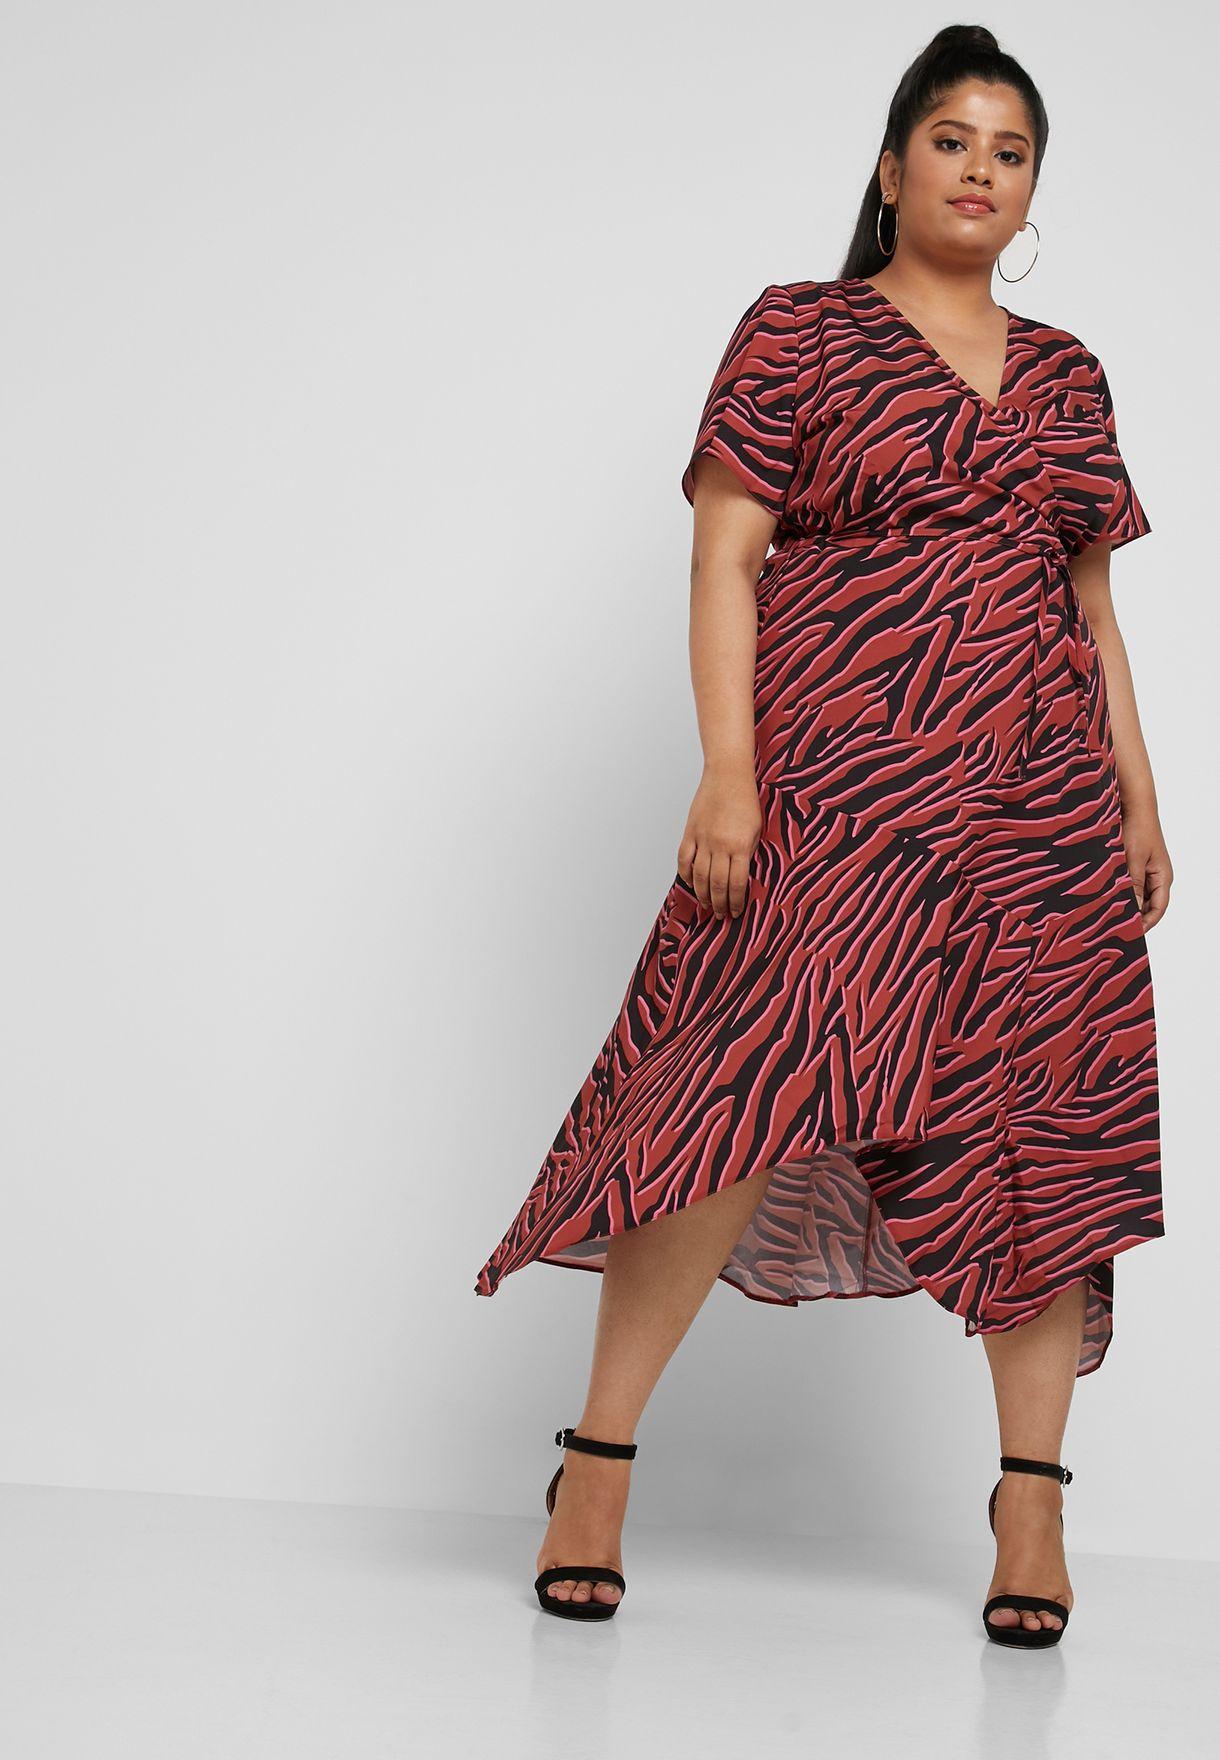 1f089201d82 Shop Lost Ink Plus prints Zebra Print Wrap Dress 1.20312E+15 for ...